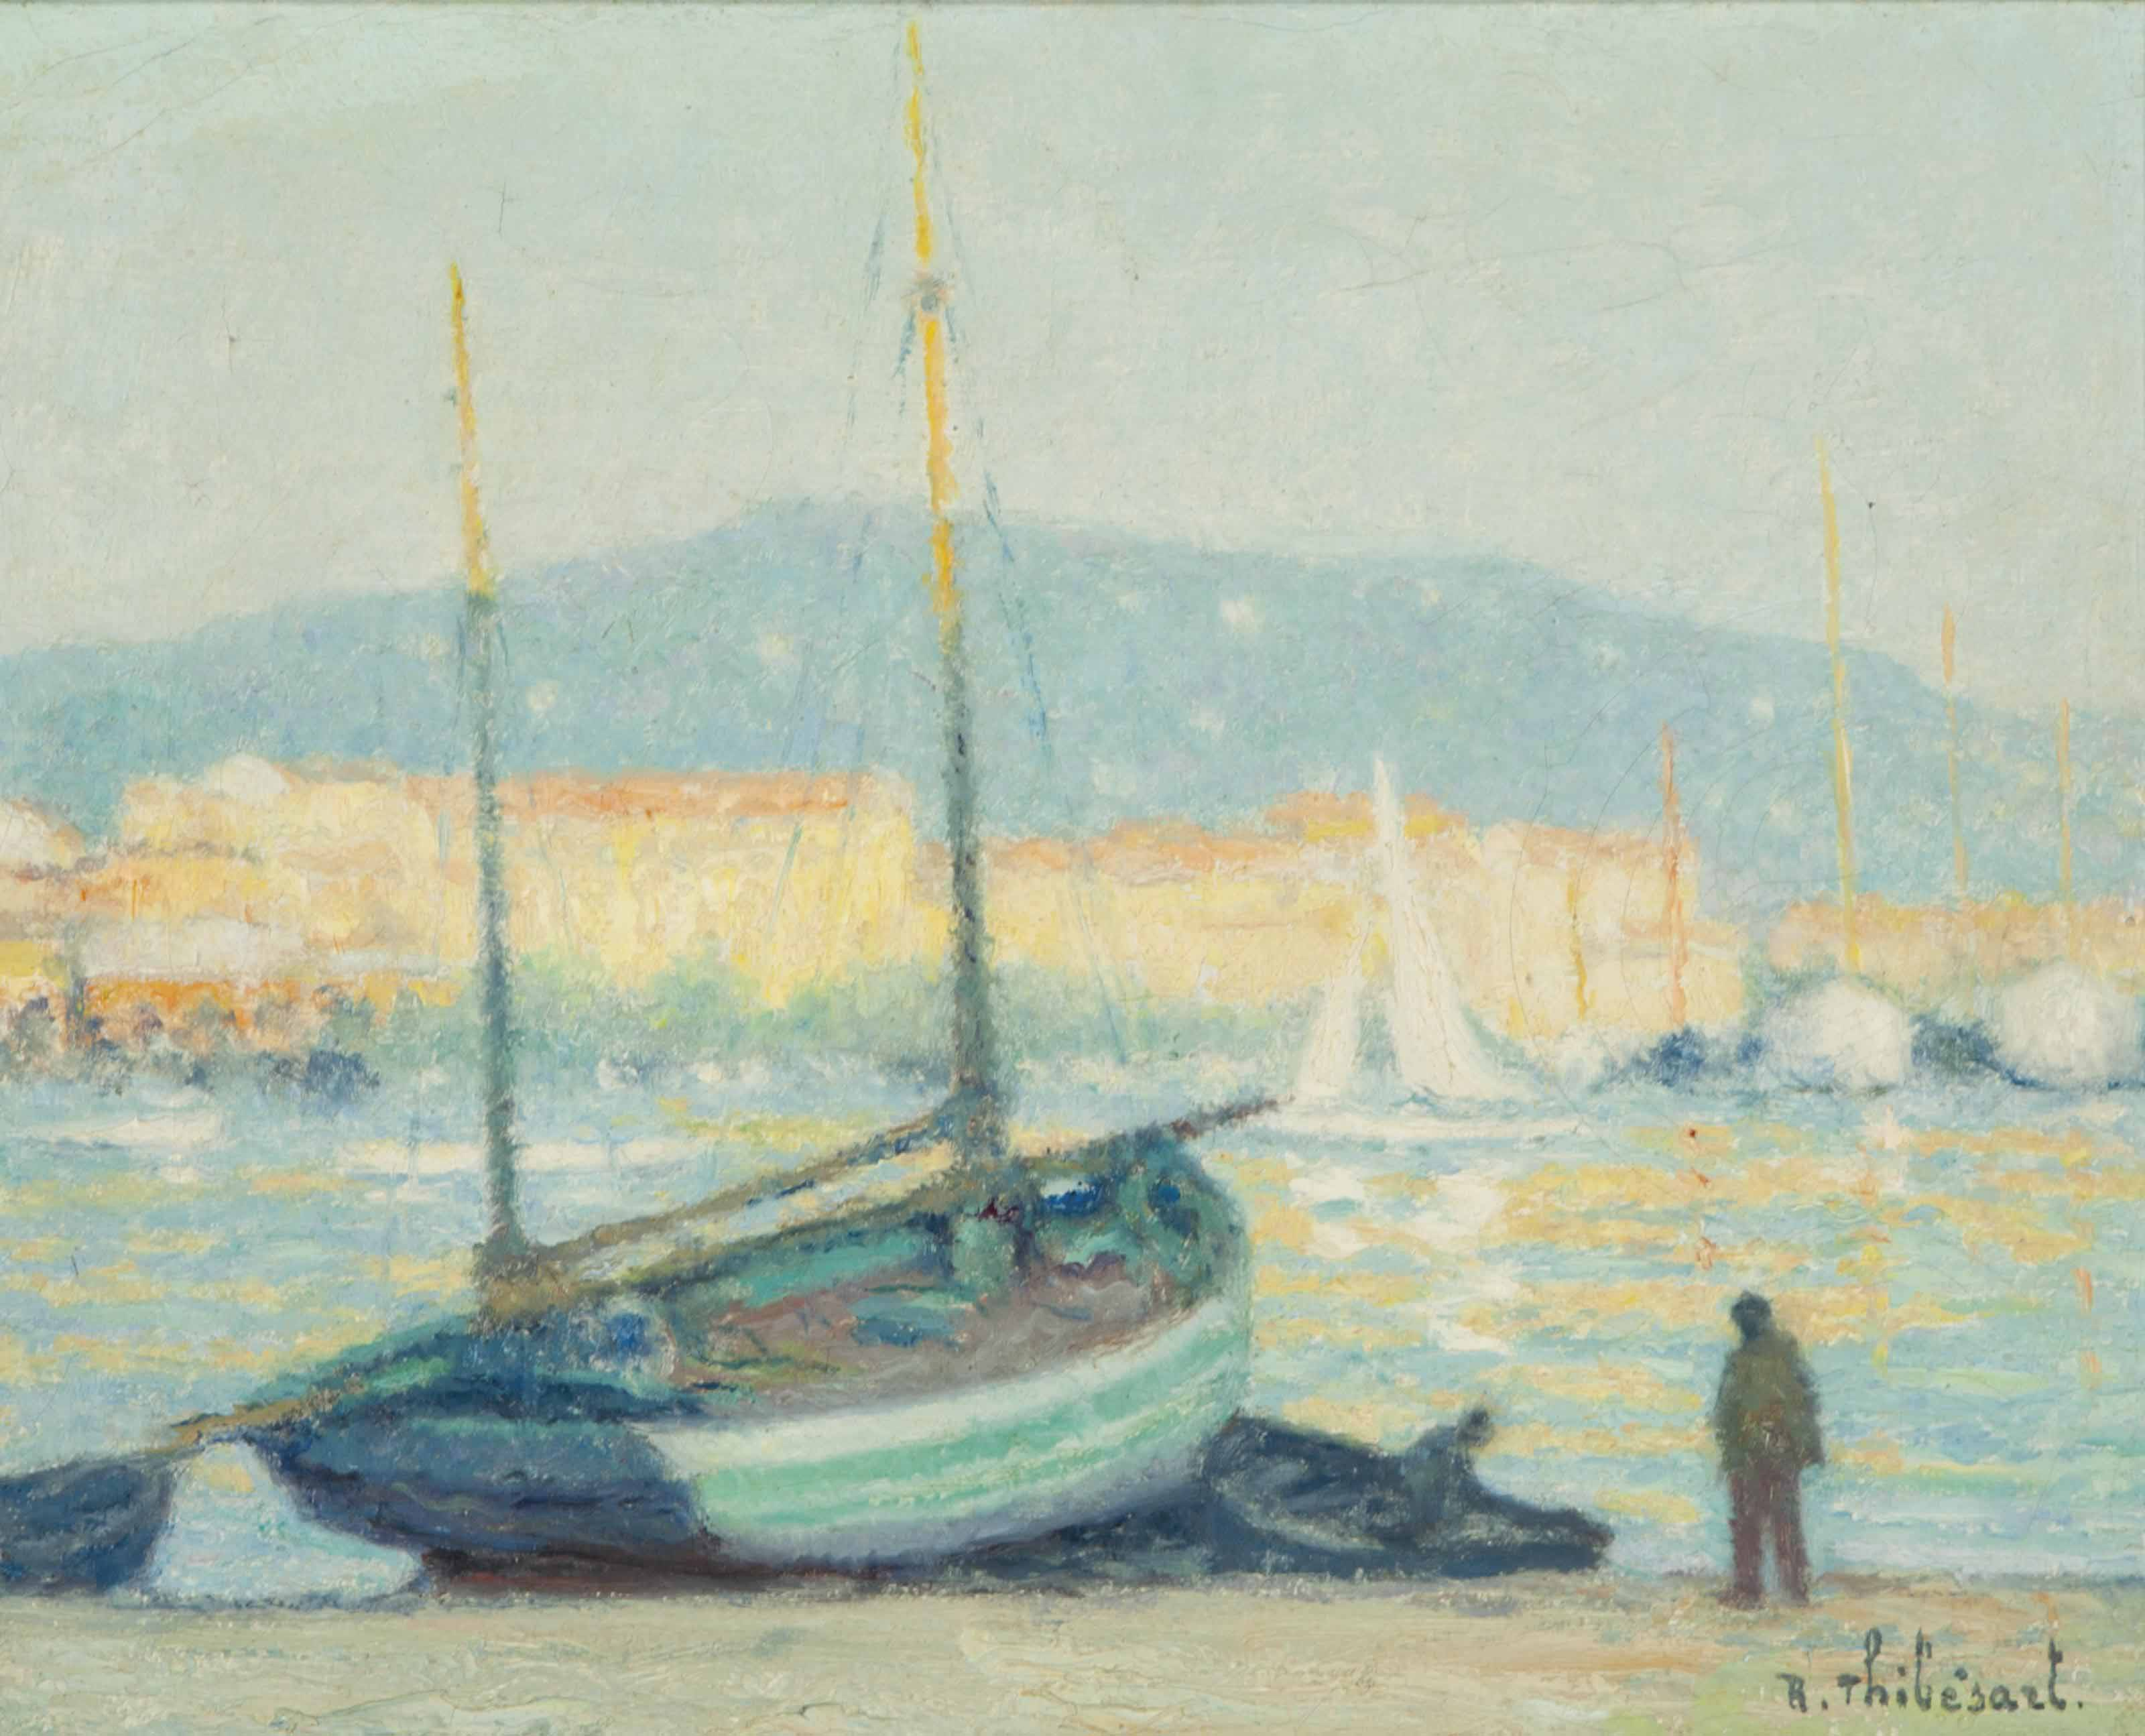 Raymond Thibésart (French, 1874-1968)